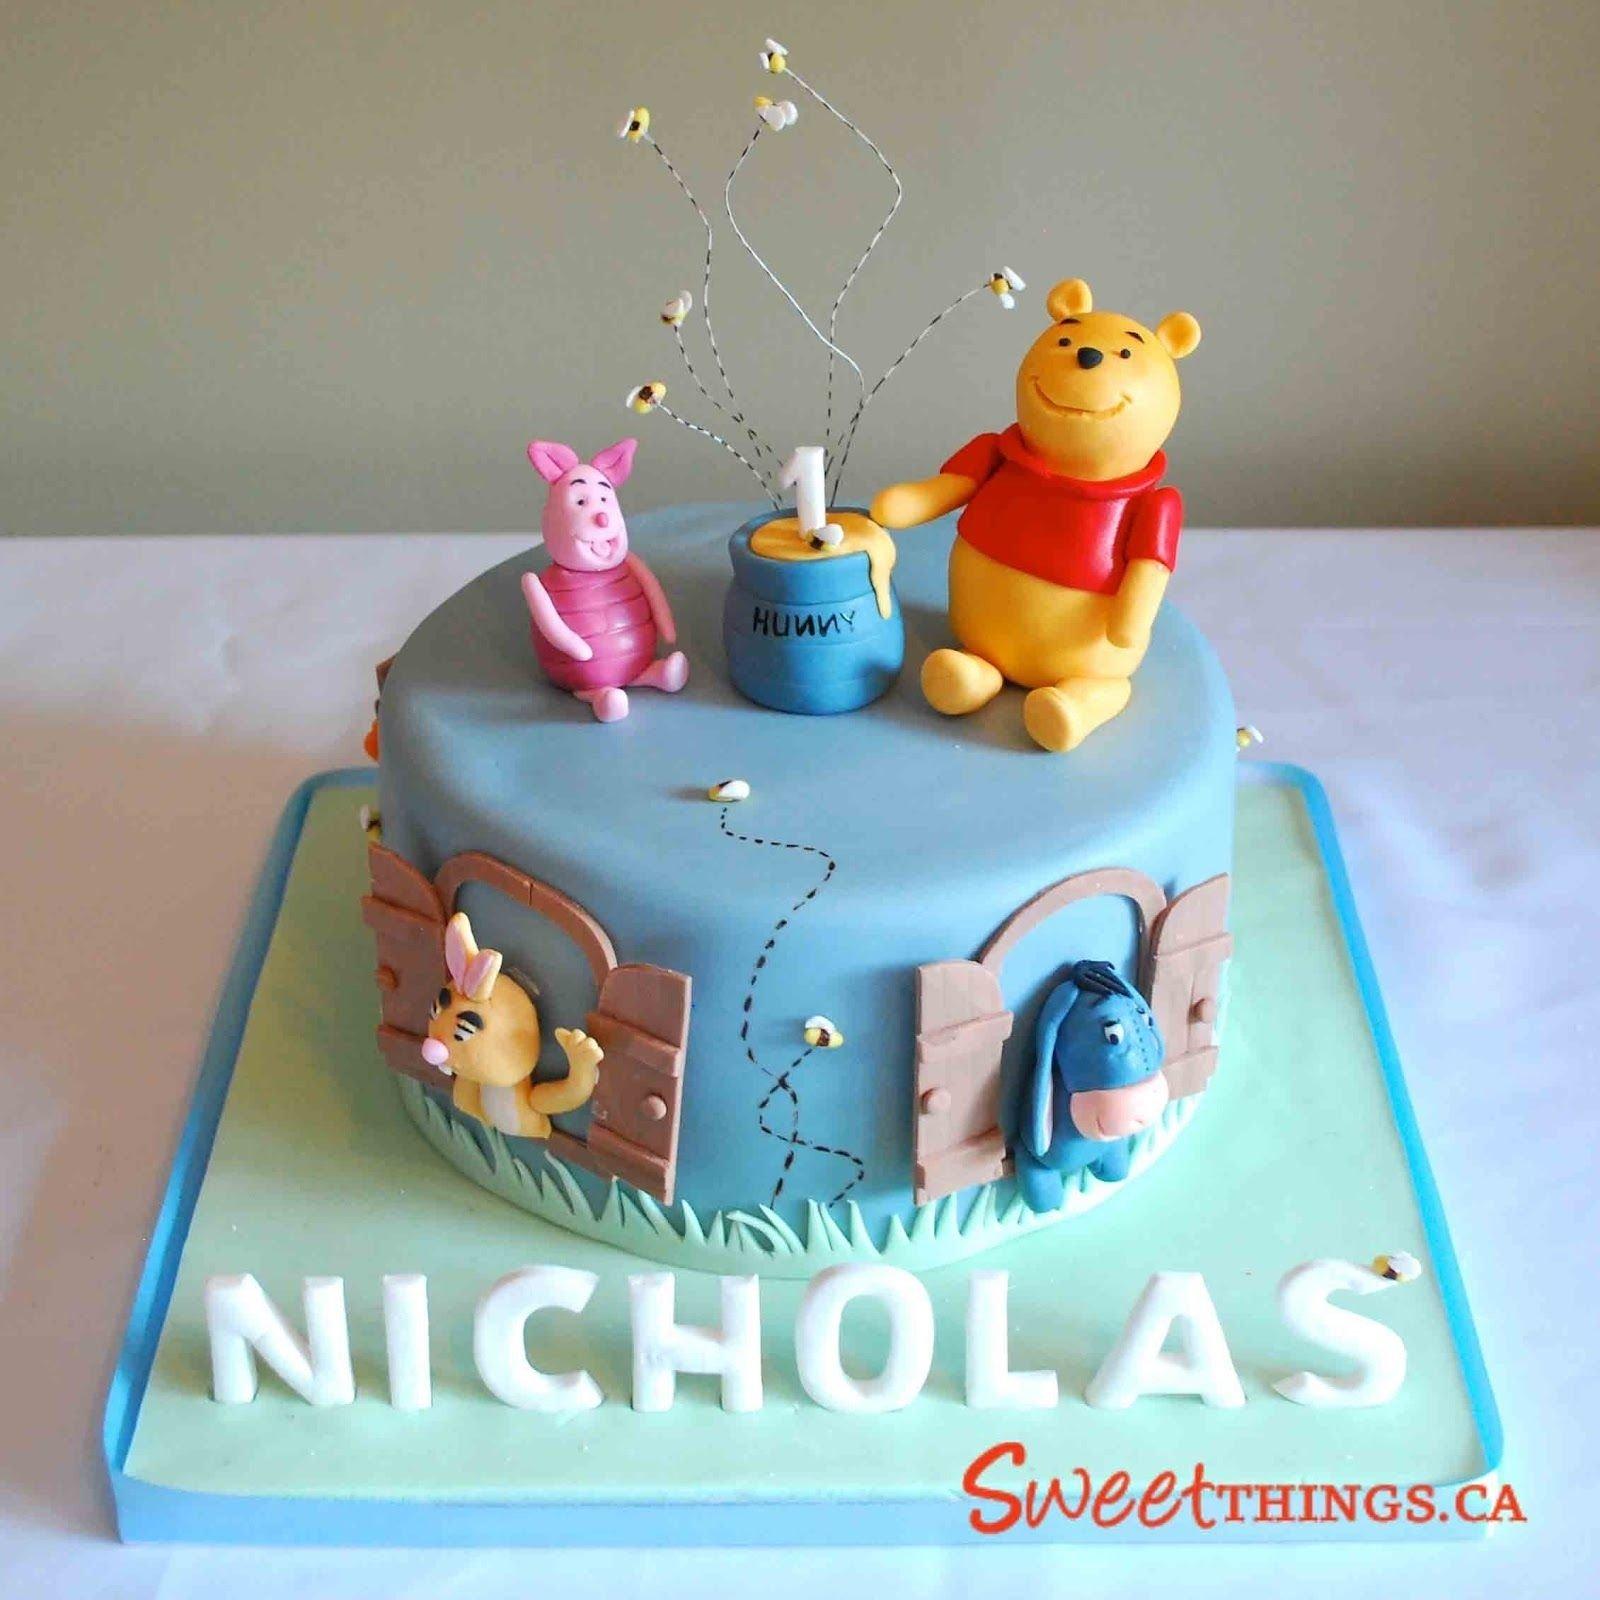 10 Fantastic Winnie The Pooh Cake Ideas sweetthings winnie the pooh cake party ideas pinterest 2020